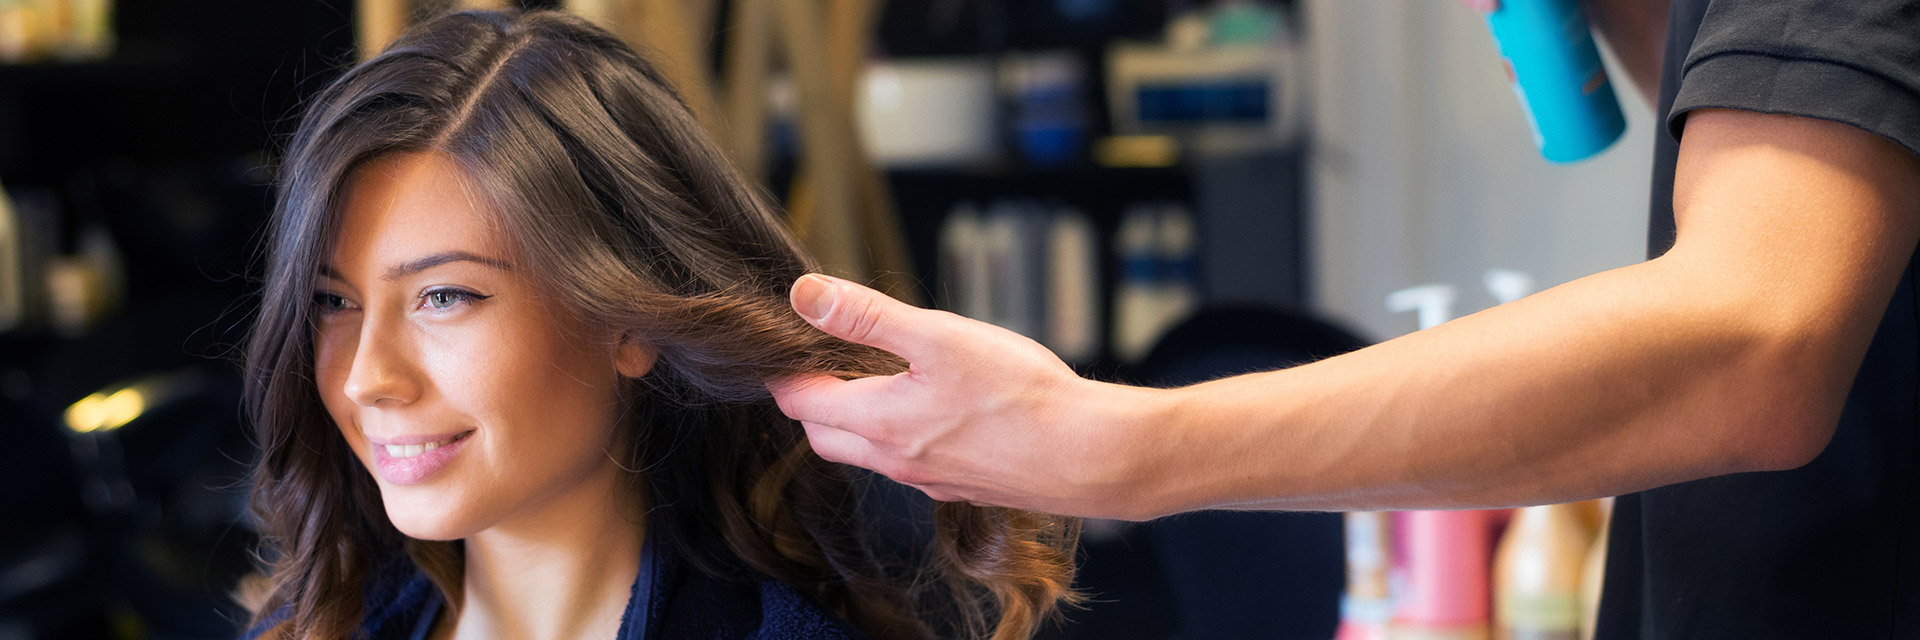 Hair Salon, at McGregor Square, Denver, Colorado